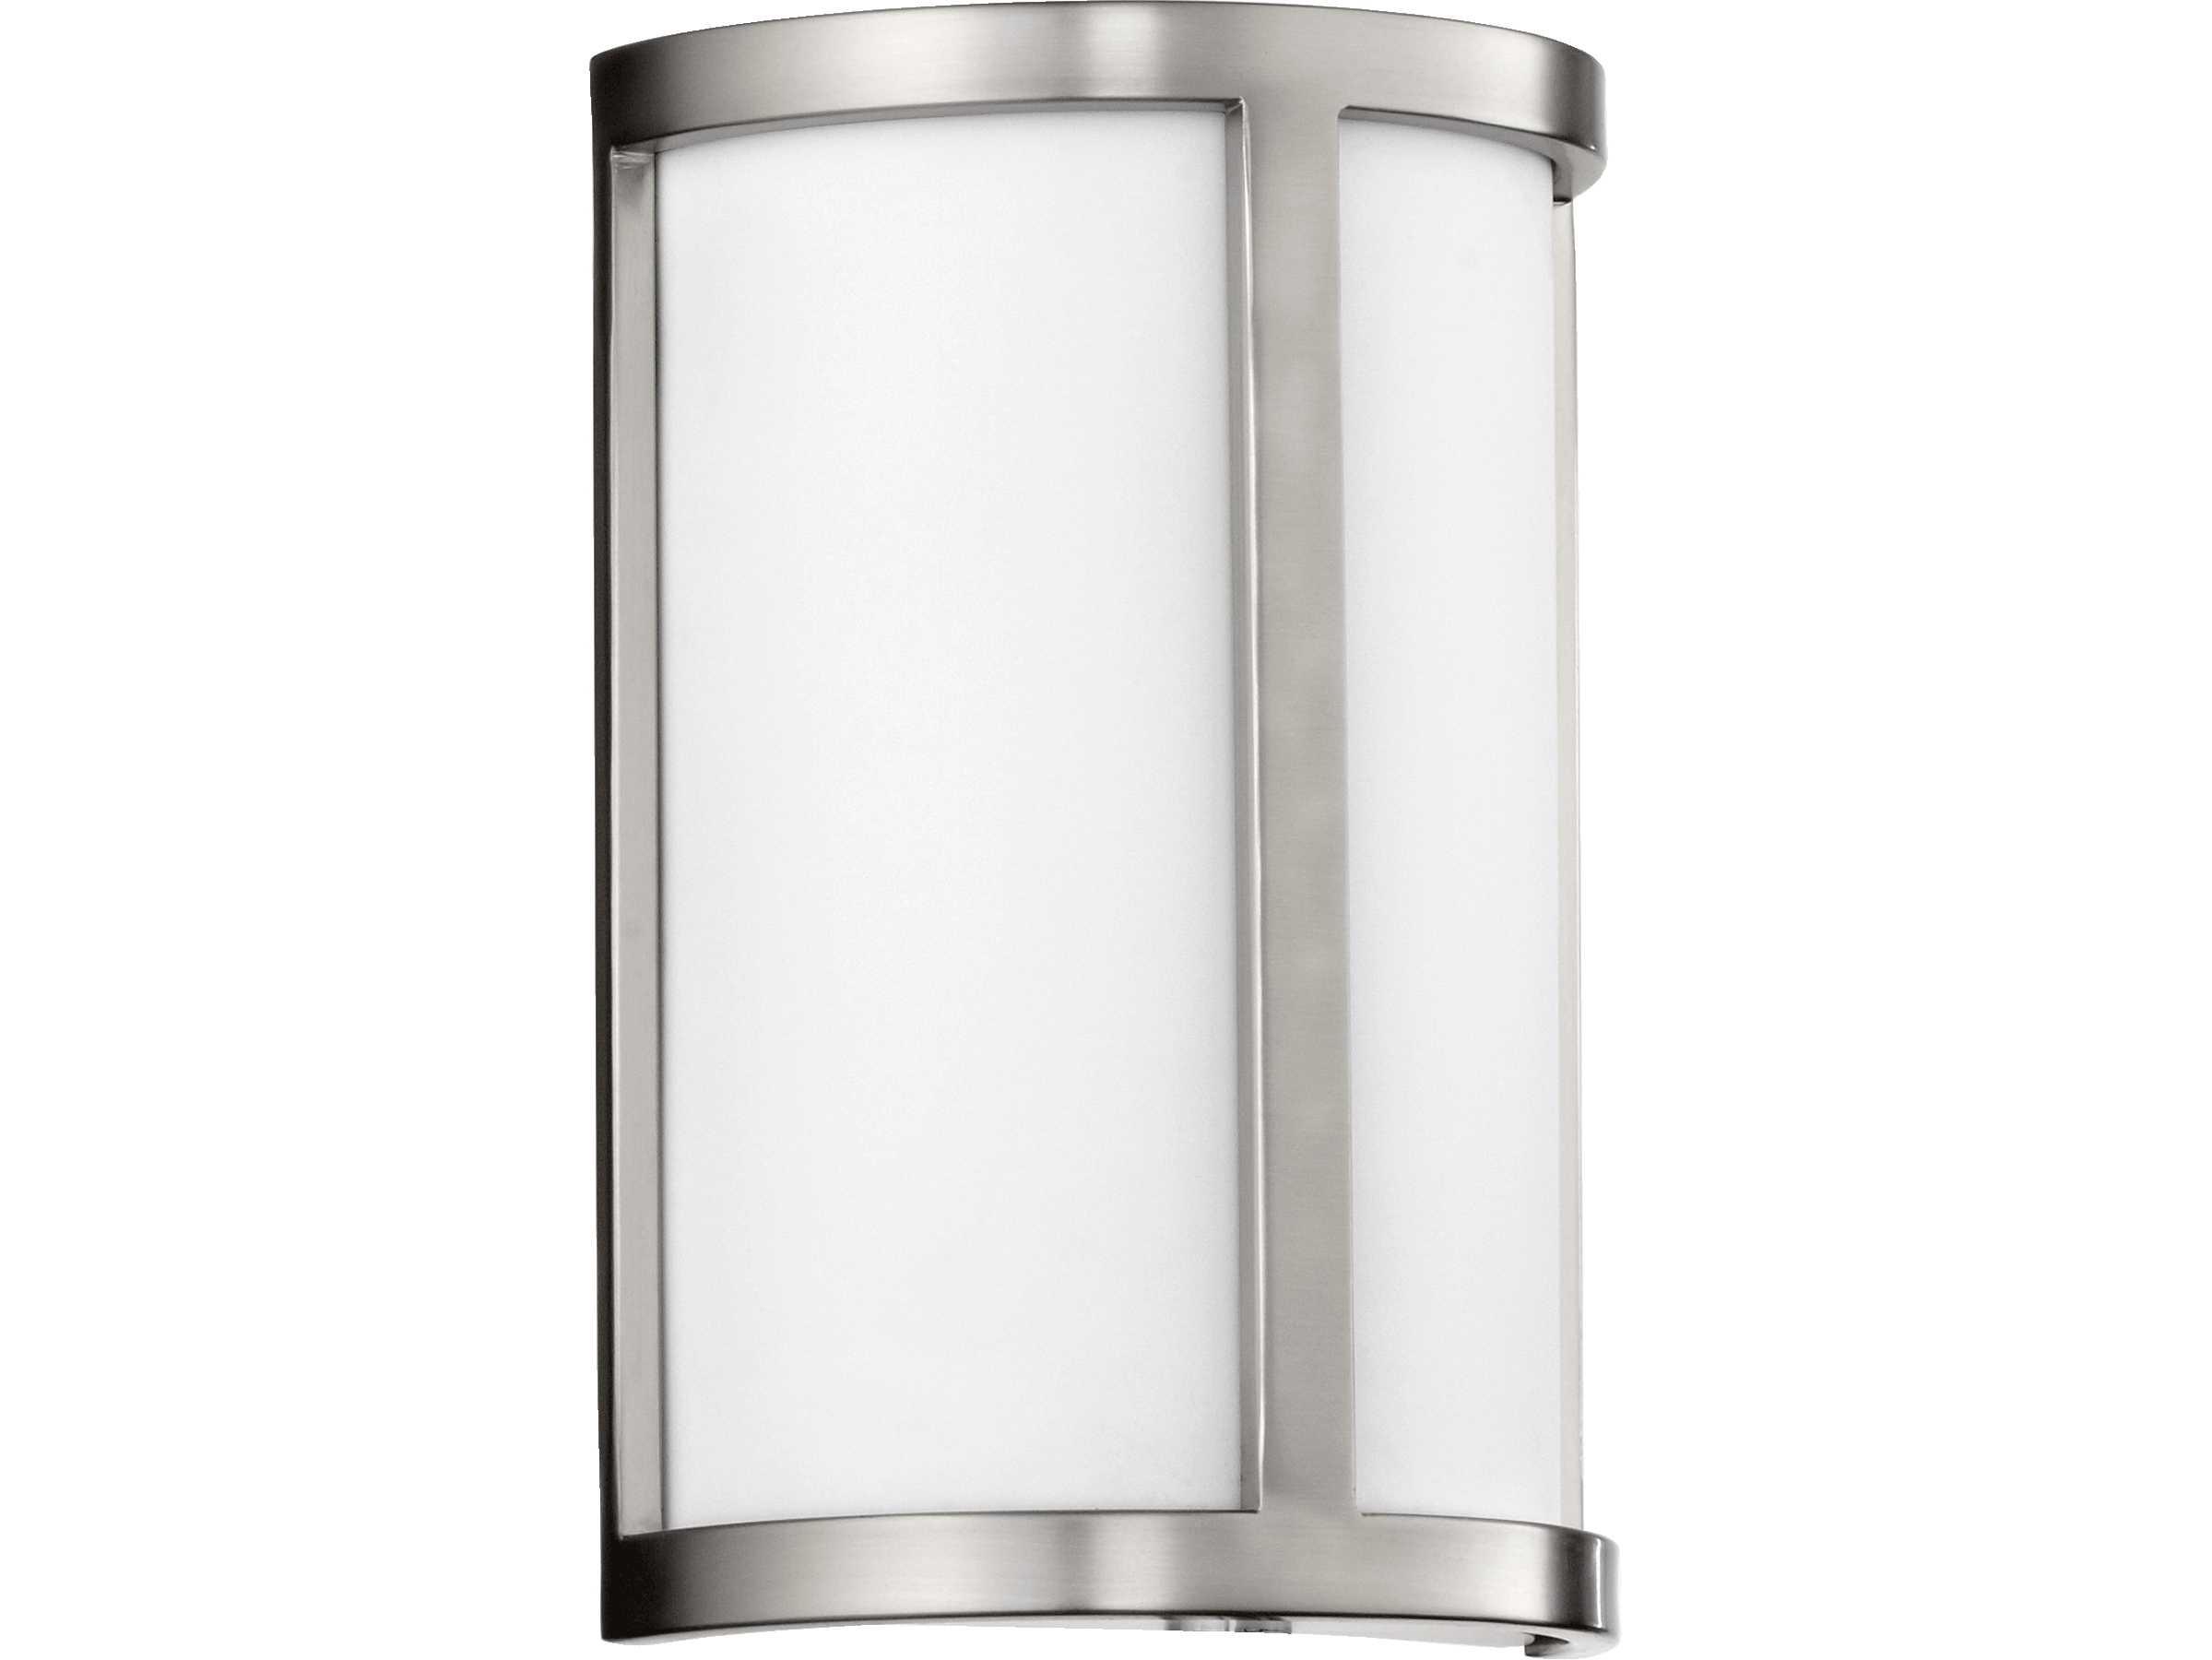 Quorum international omega satin nickel two lights wall for International decor wall lights